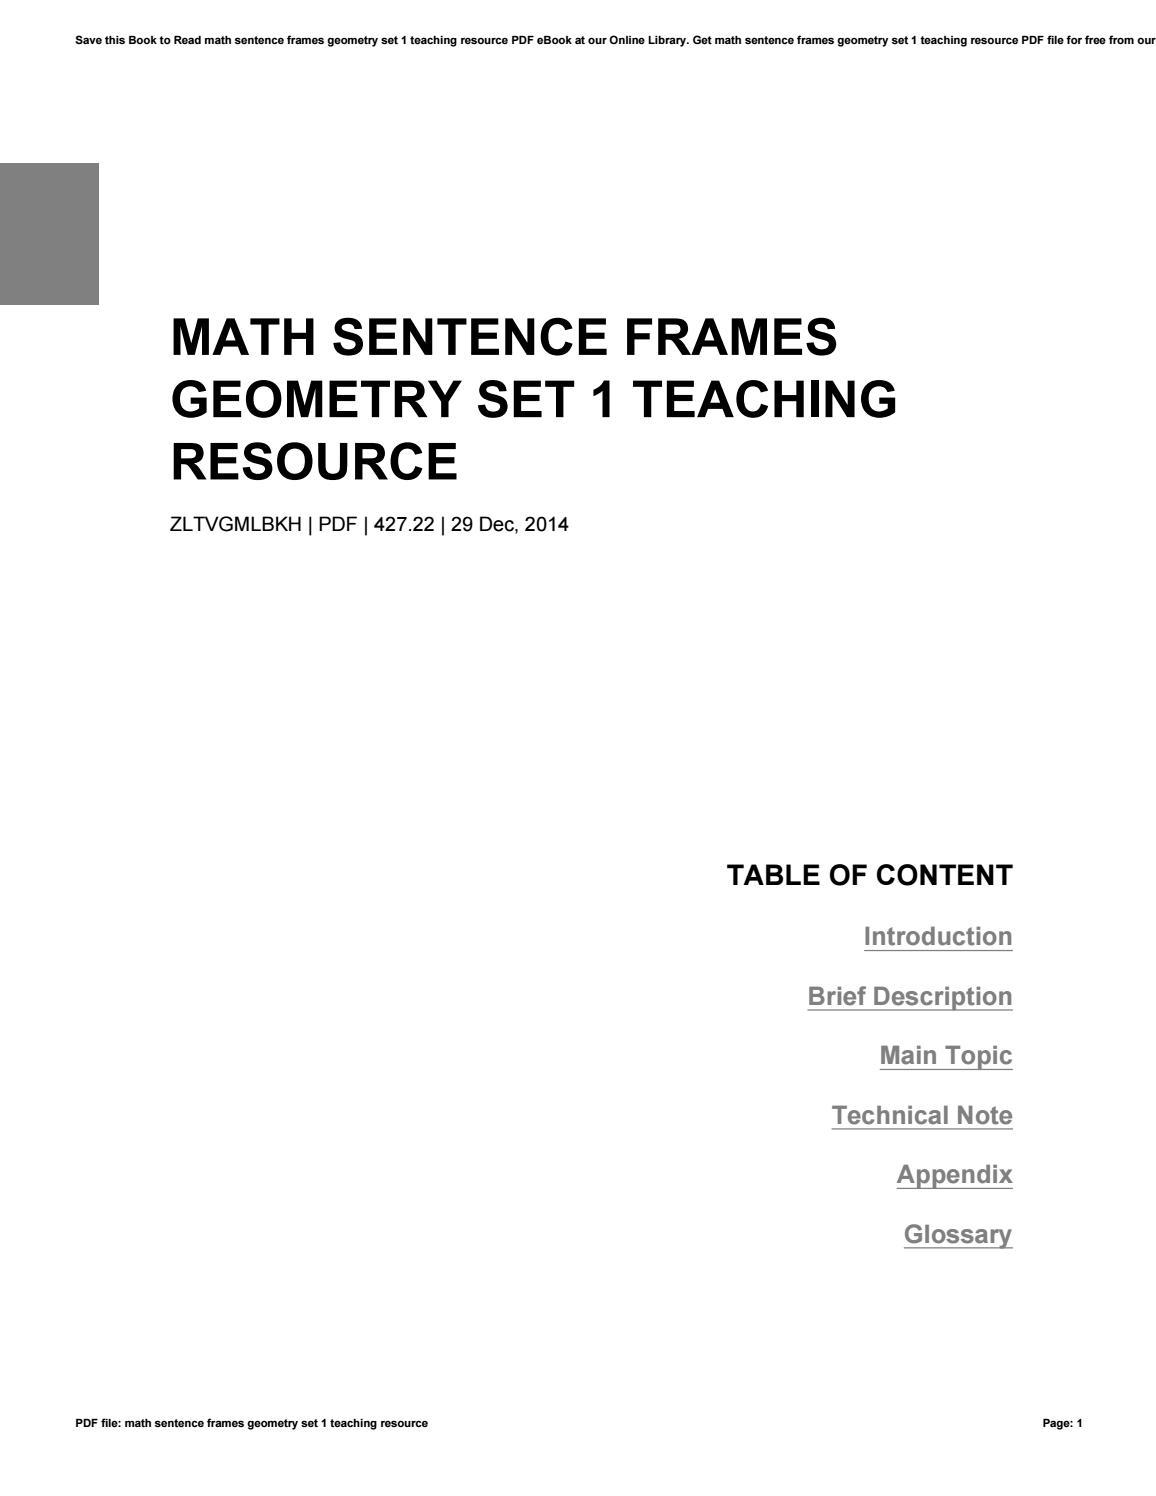 Math sentence frames geometry set 1 teaching resource by